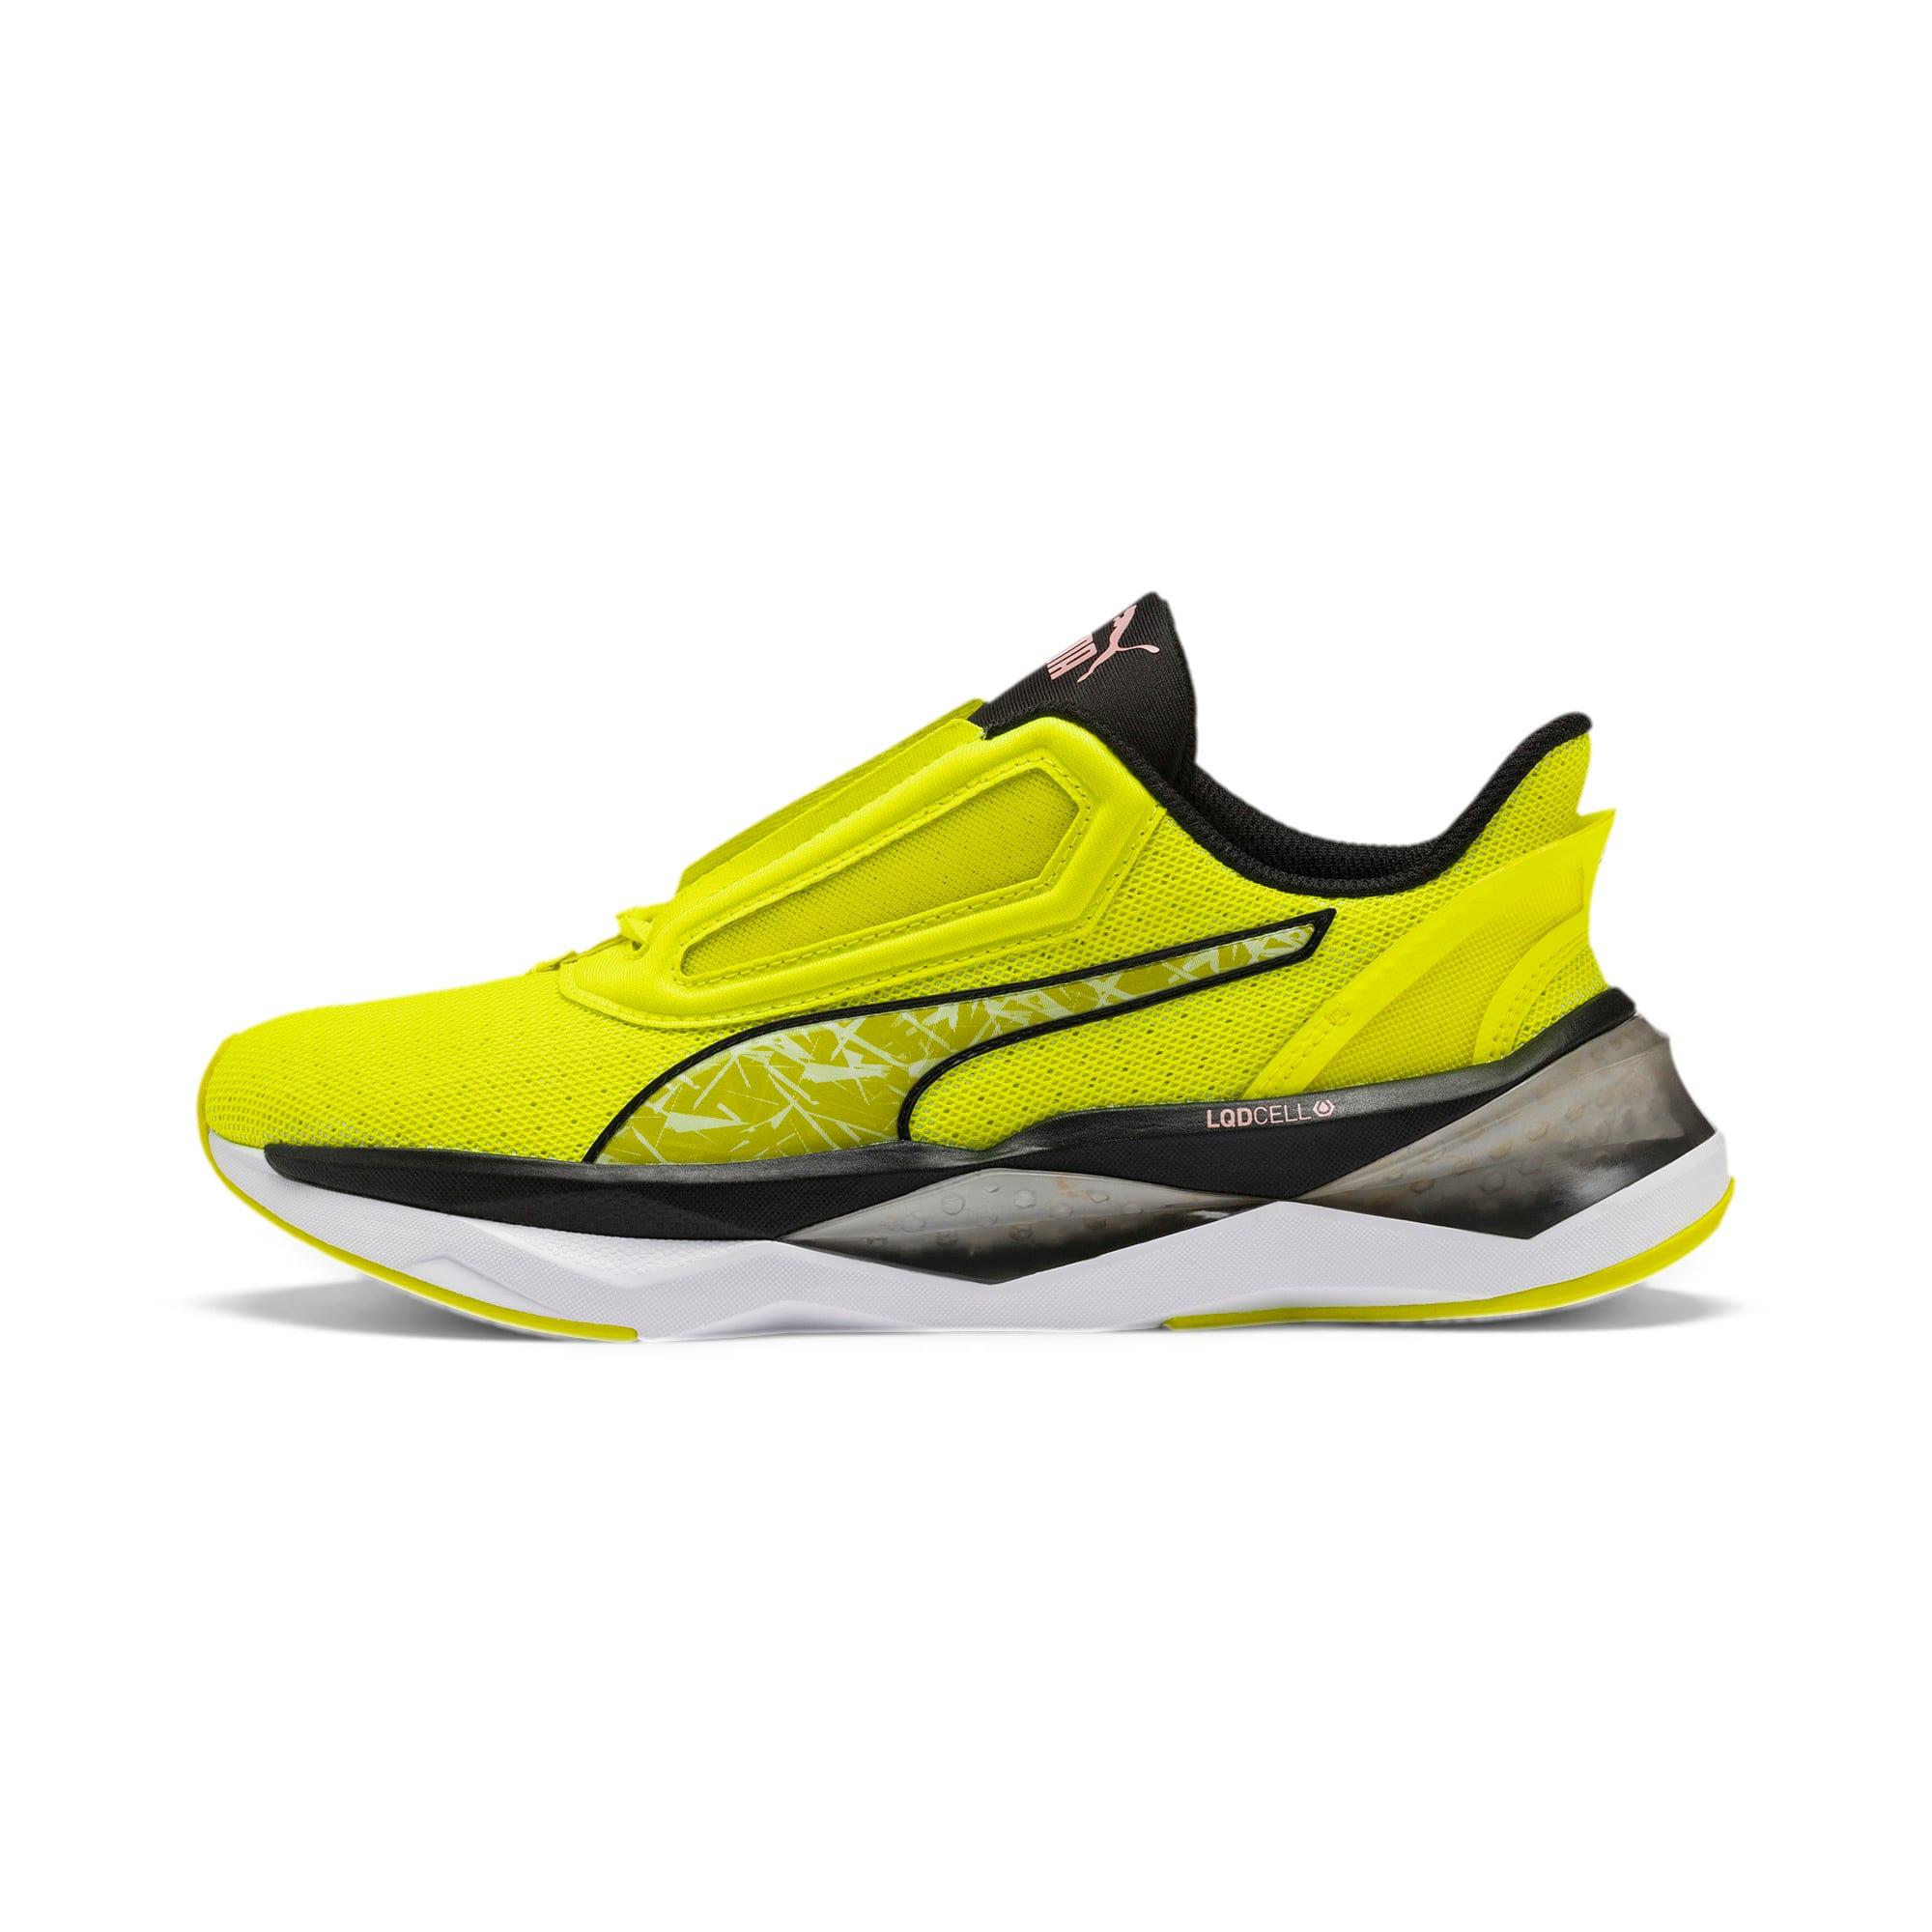 Thumbnail 1 of LQDCELL Shatter XT Shift Women's Training Shoes, Yellow Alert-Puma Black, medium